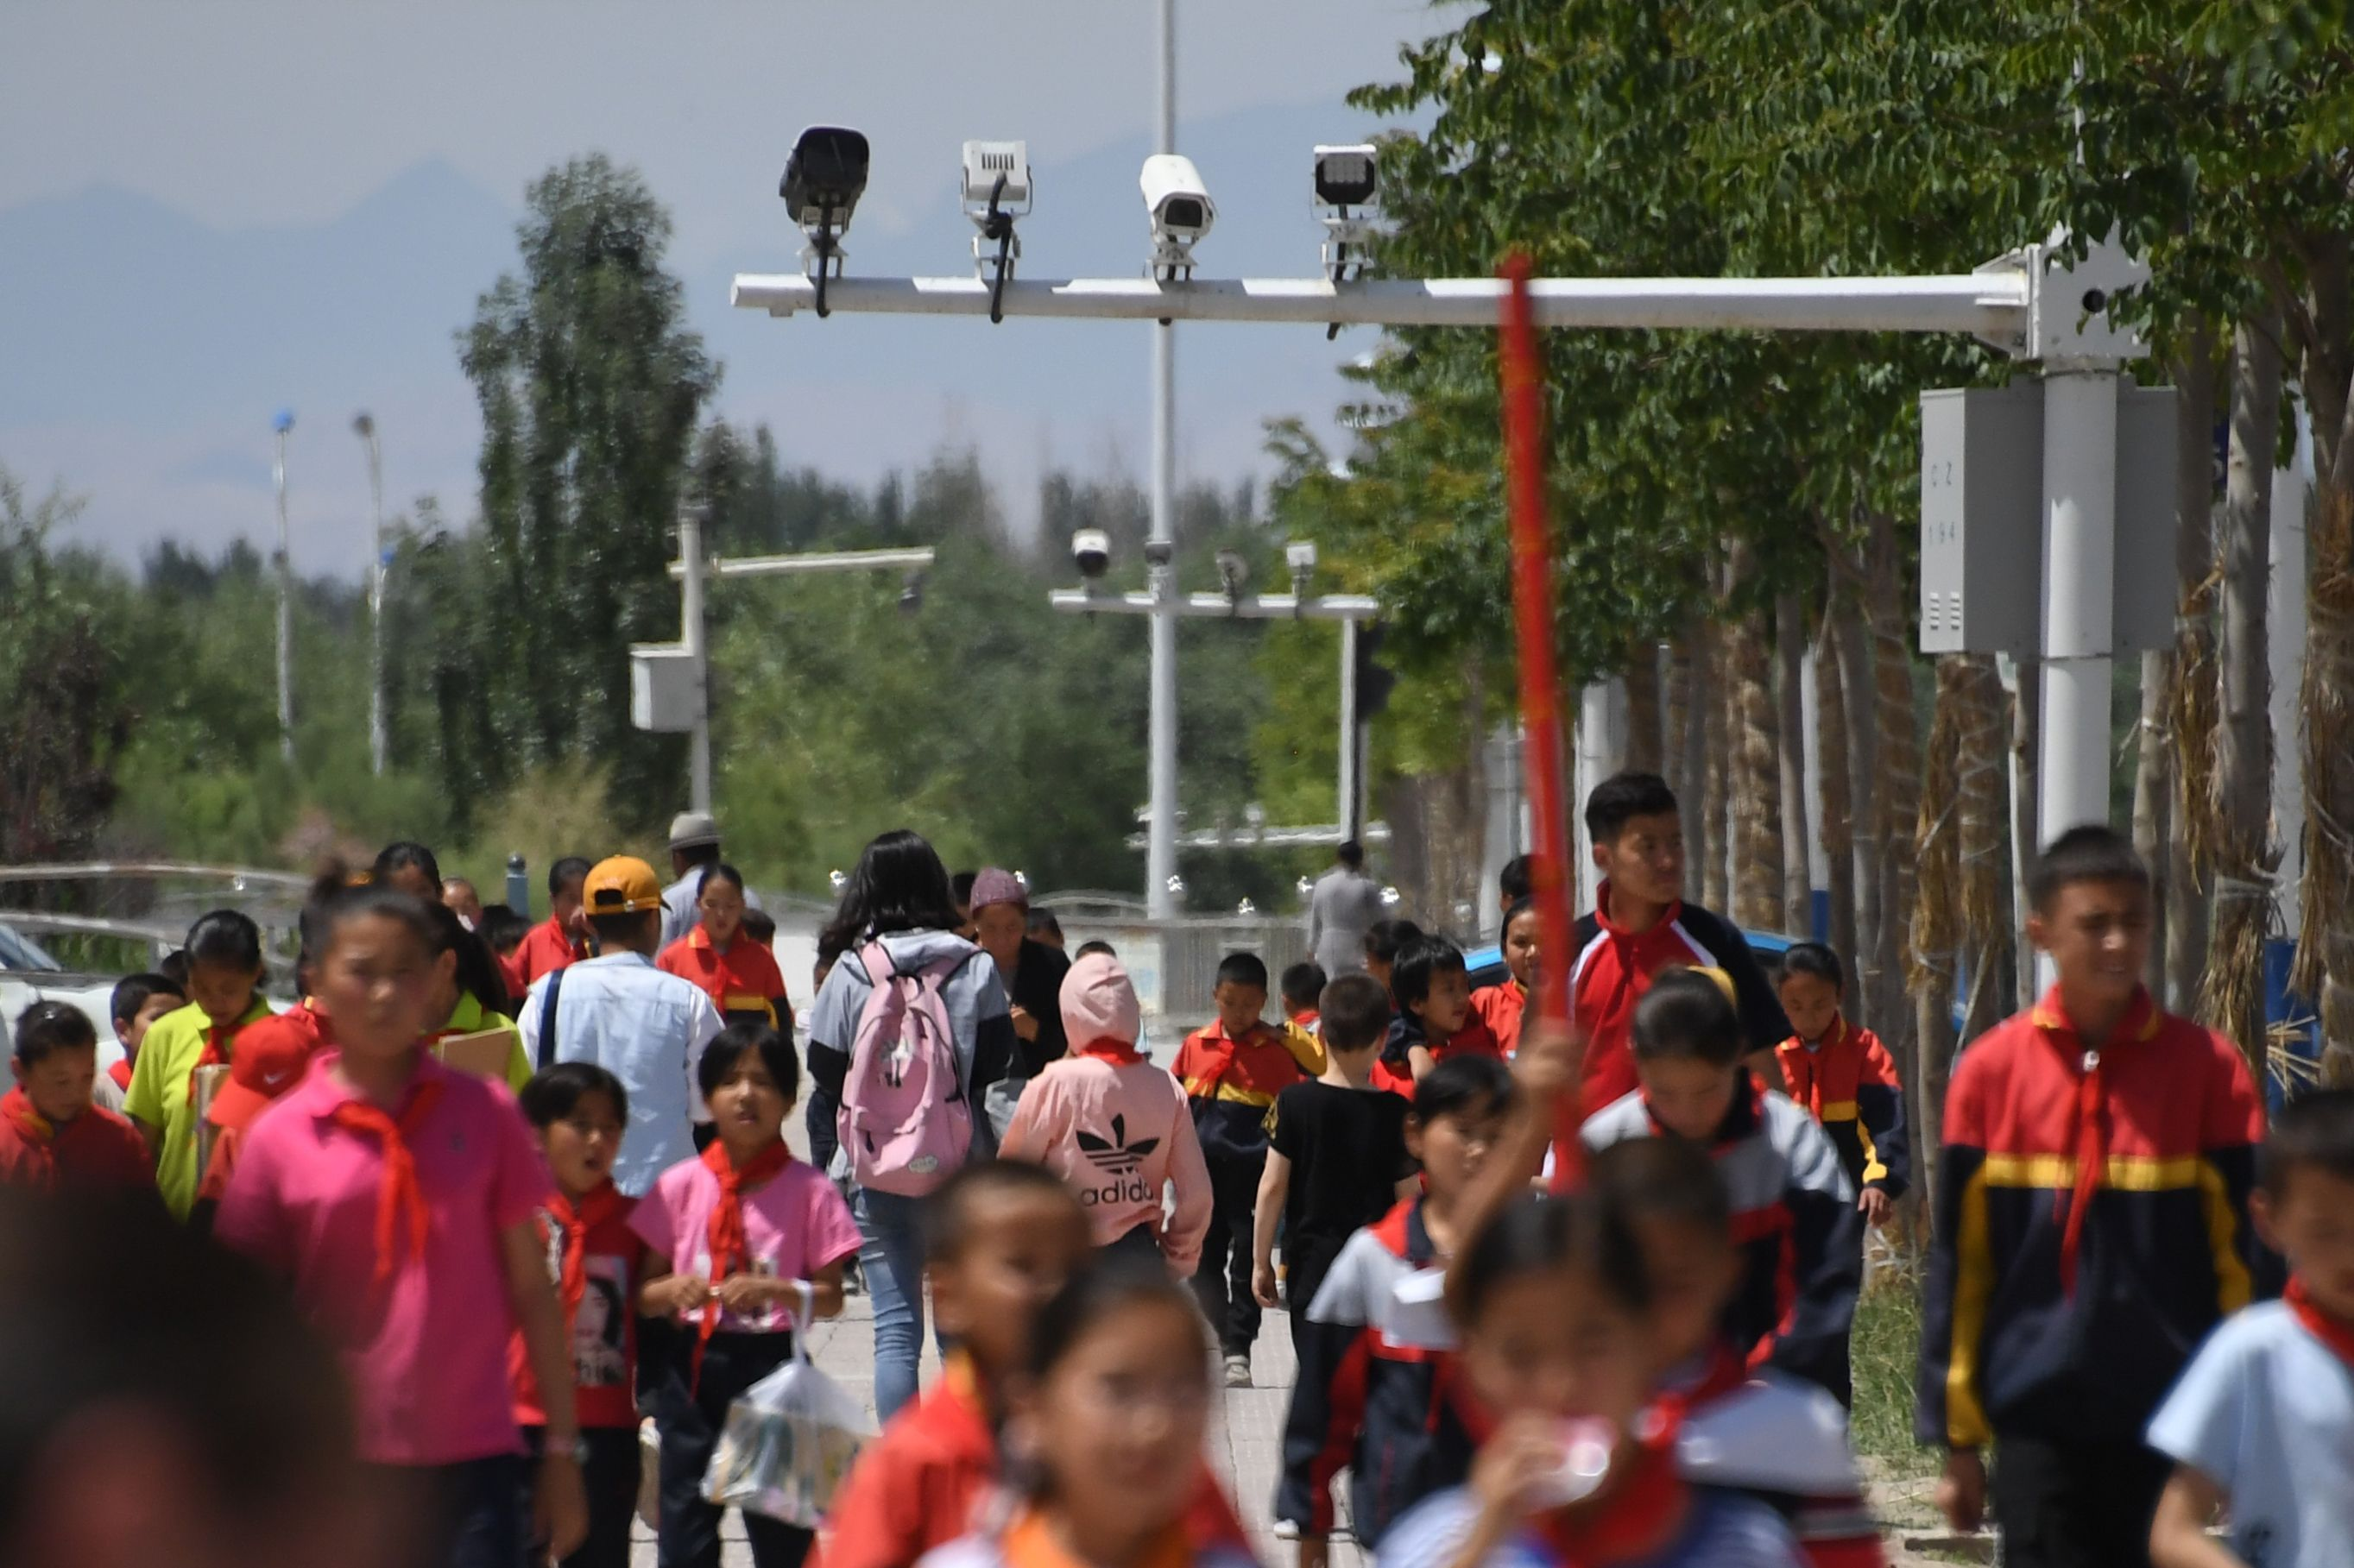 中共在新疆拘禁维吾尔族人。(图片来源:GREG BAKER/AFP via Getty Images)